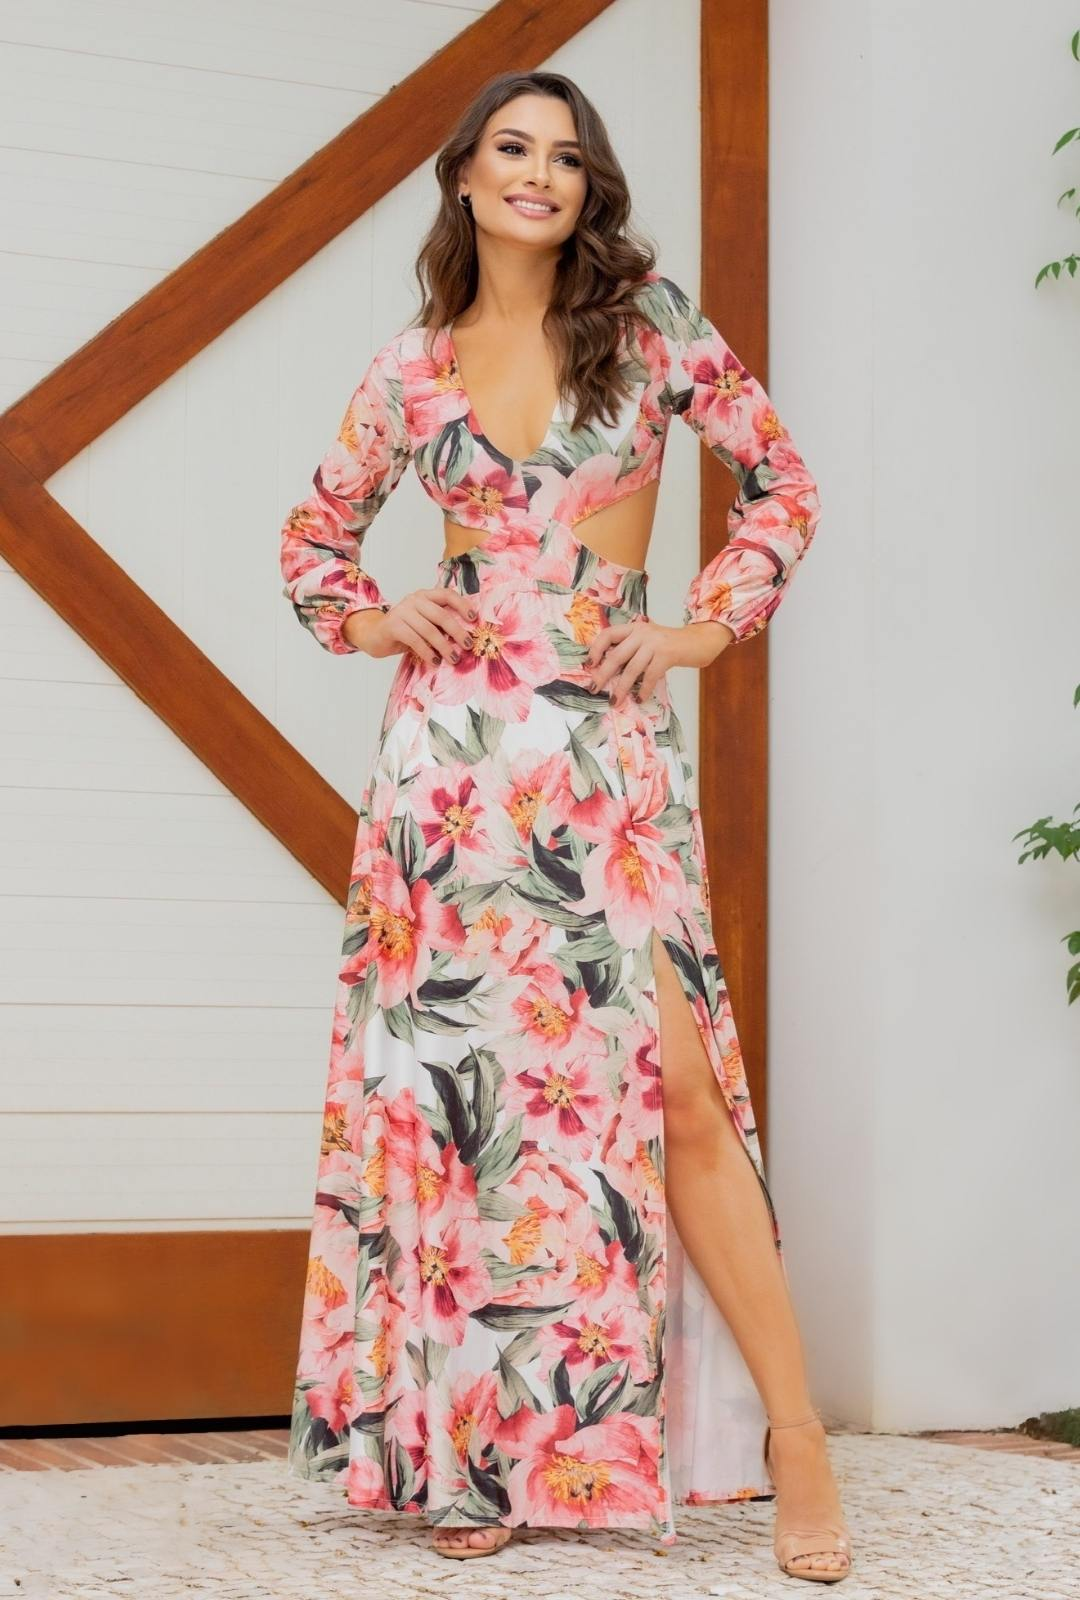 Vestido Longo Estampado Floral Lia Manga Longo Abertura  Fluity Rosa